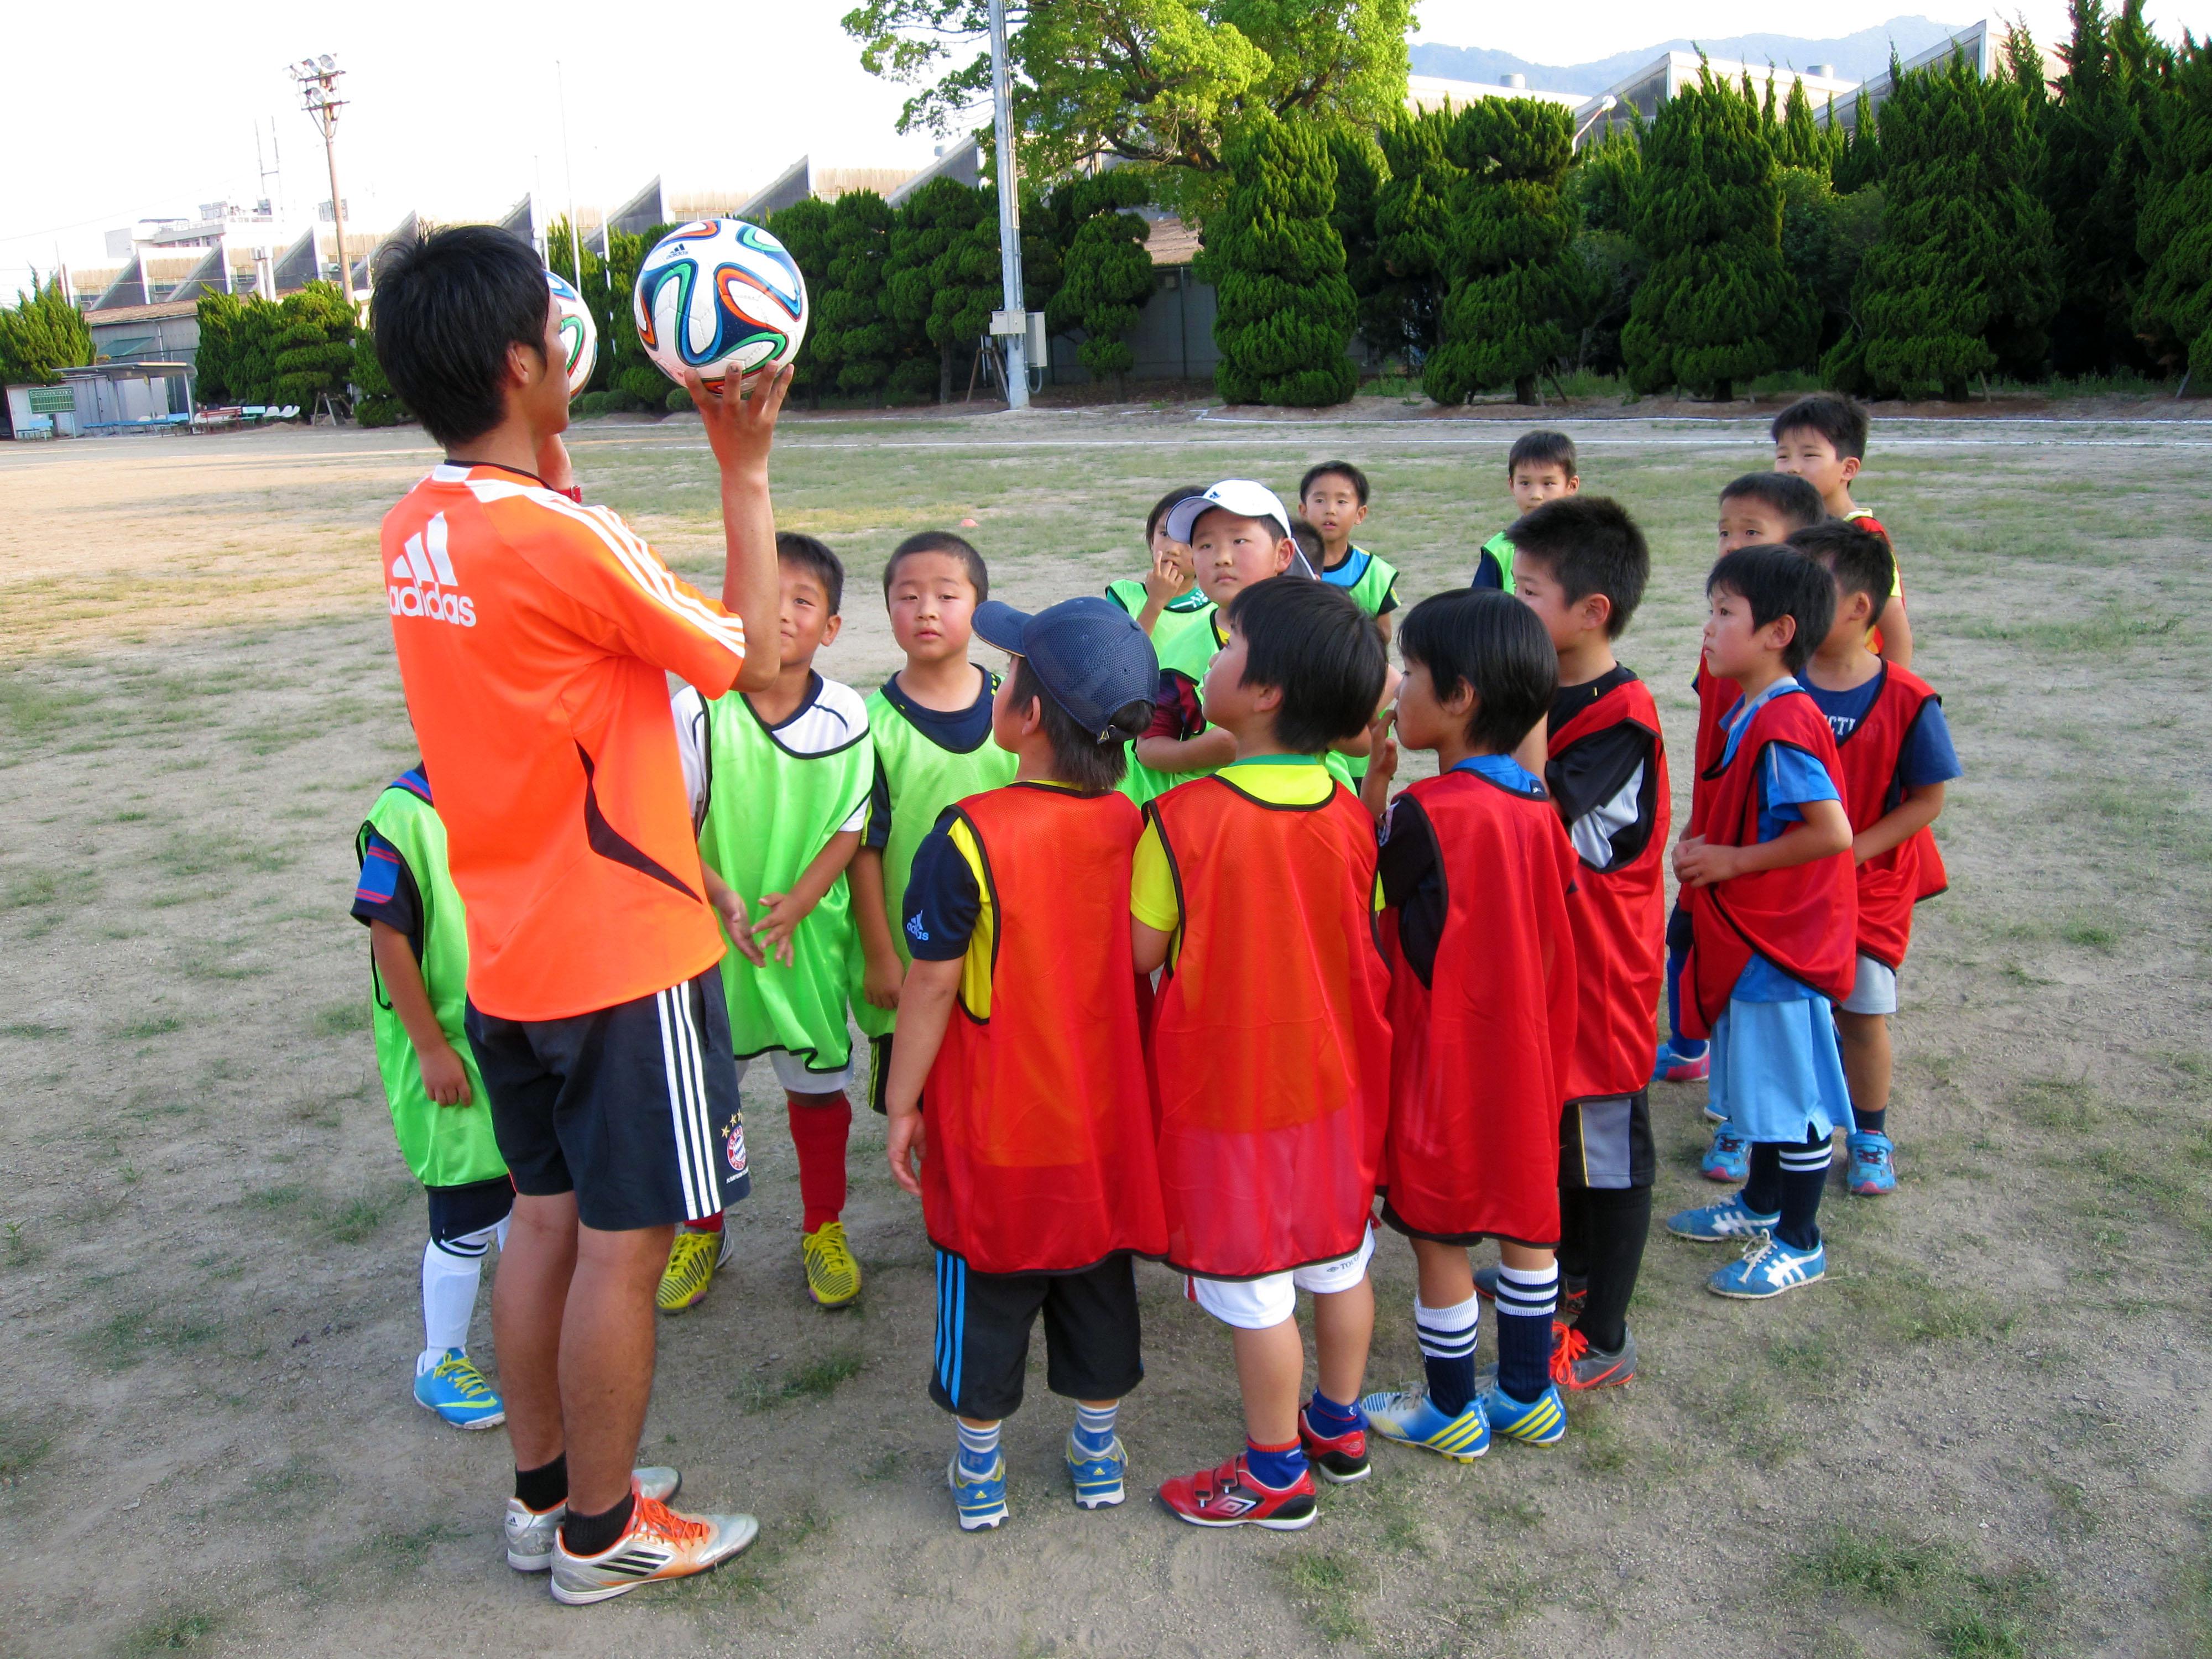 FC バイエルン ツネイシ2014年9月2日尾道スクール開校-キッズスクール生募集